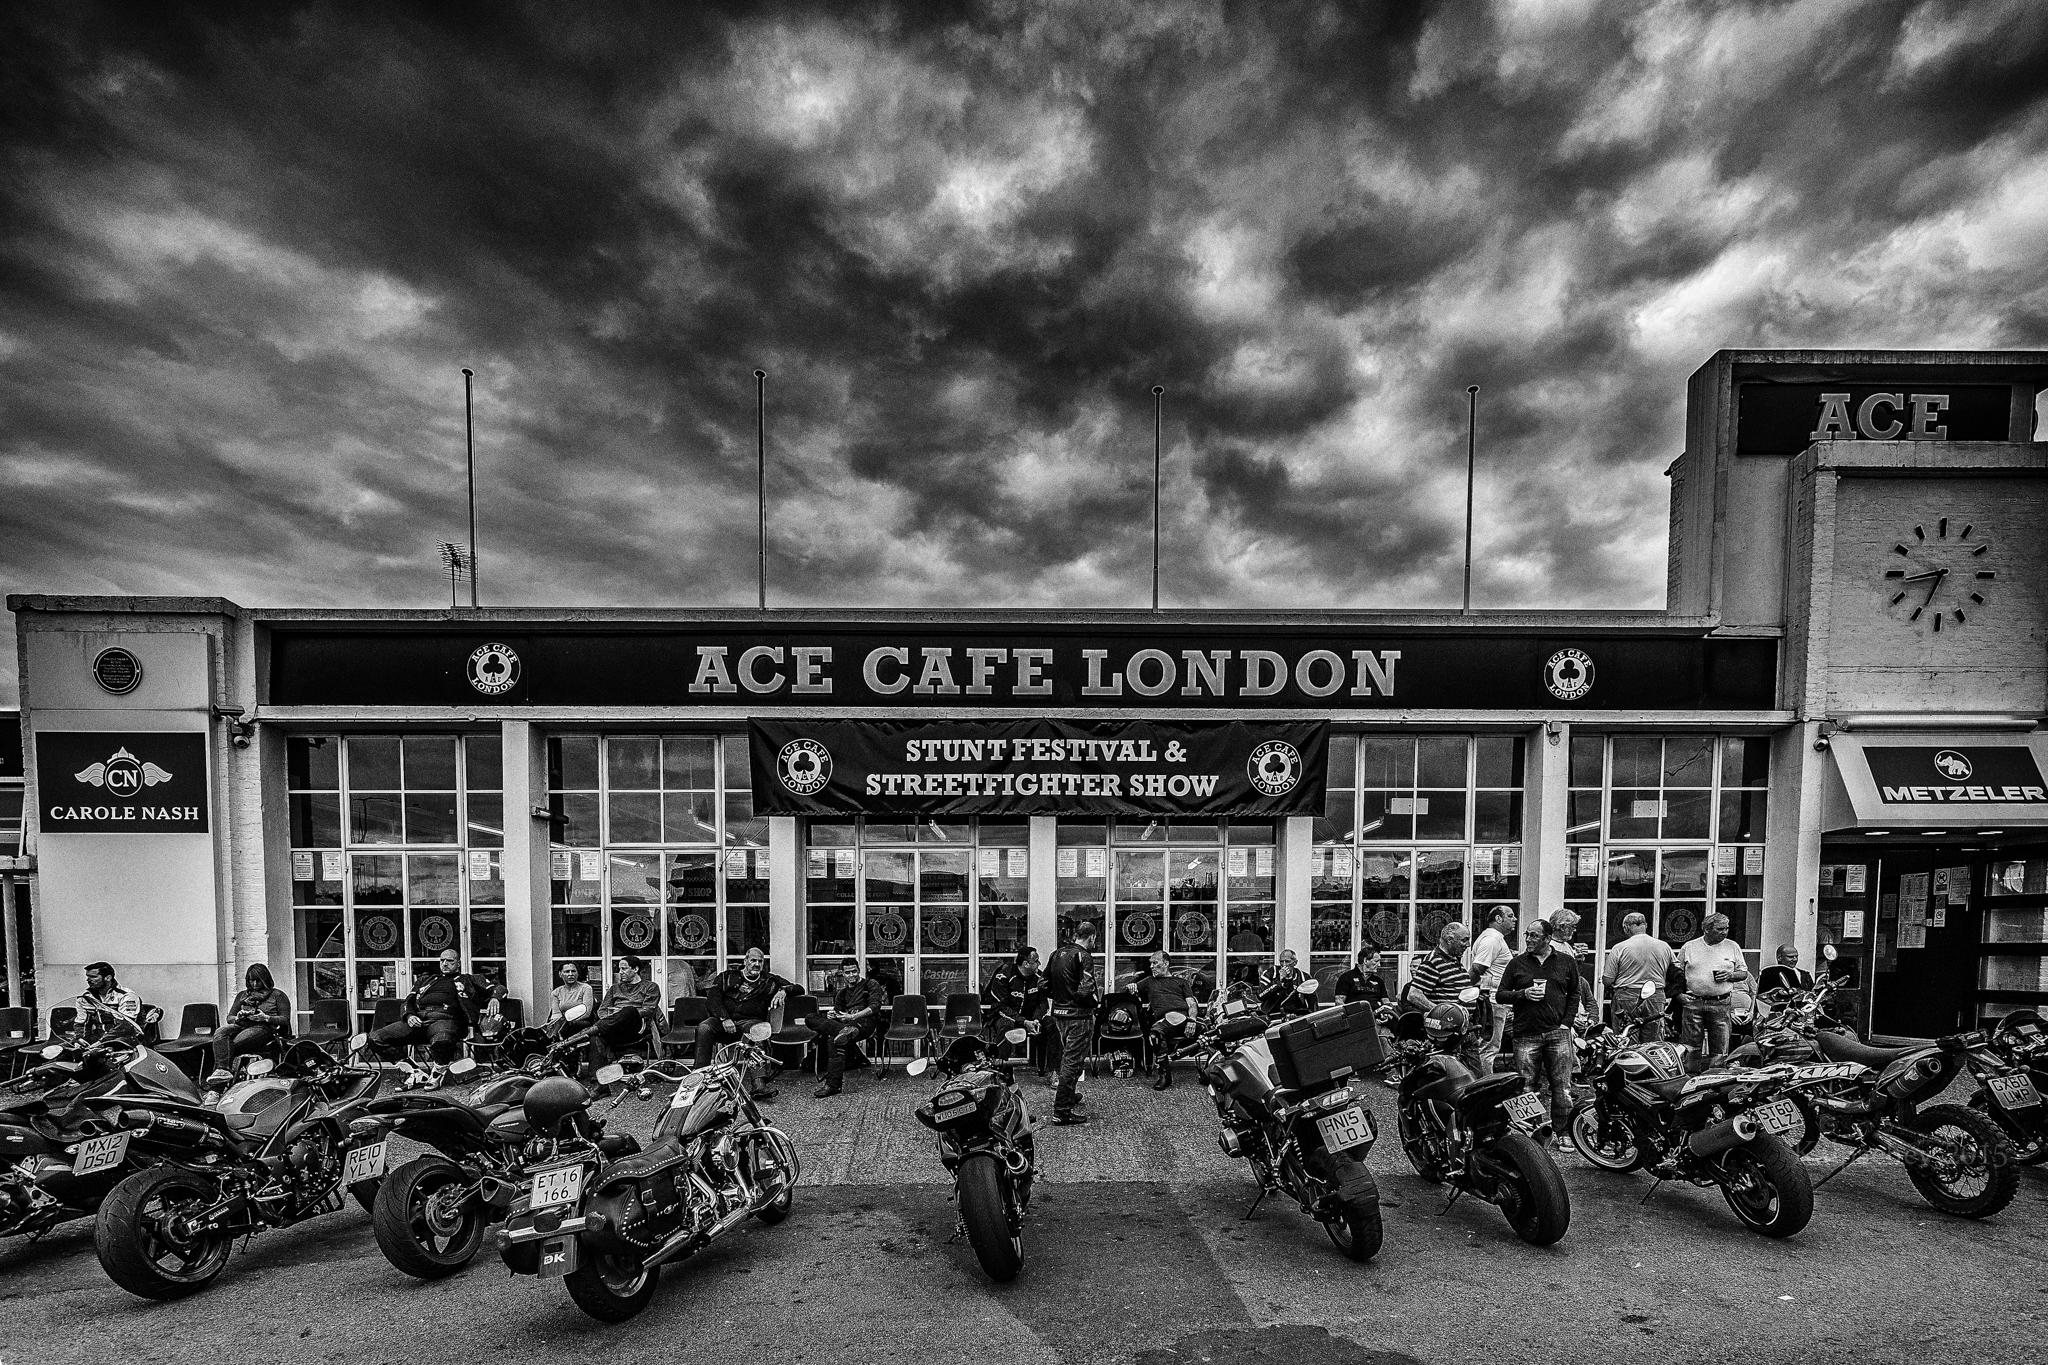 Ace Cafe London Bike Meet 22 May 2015